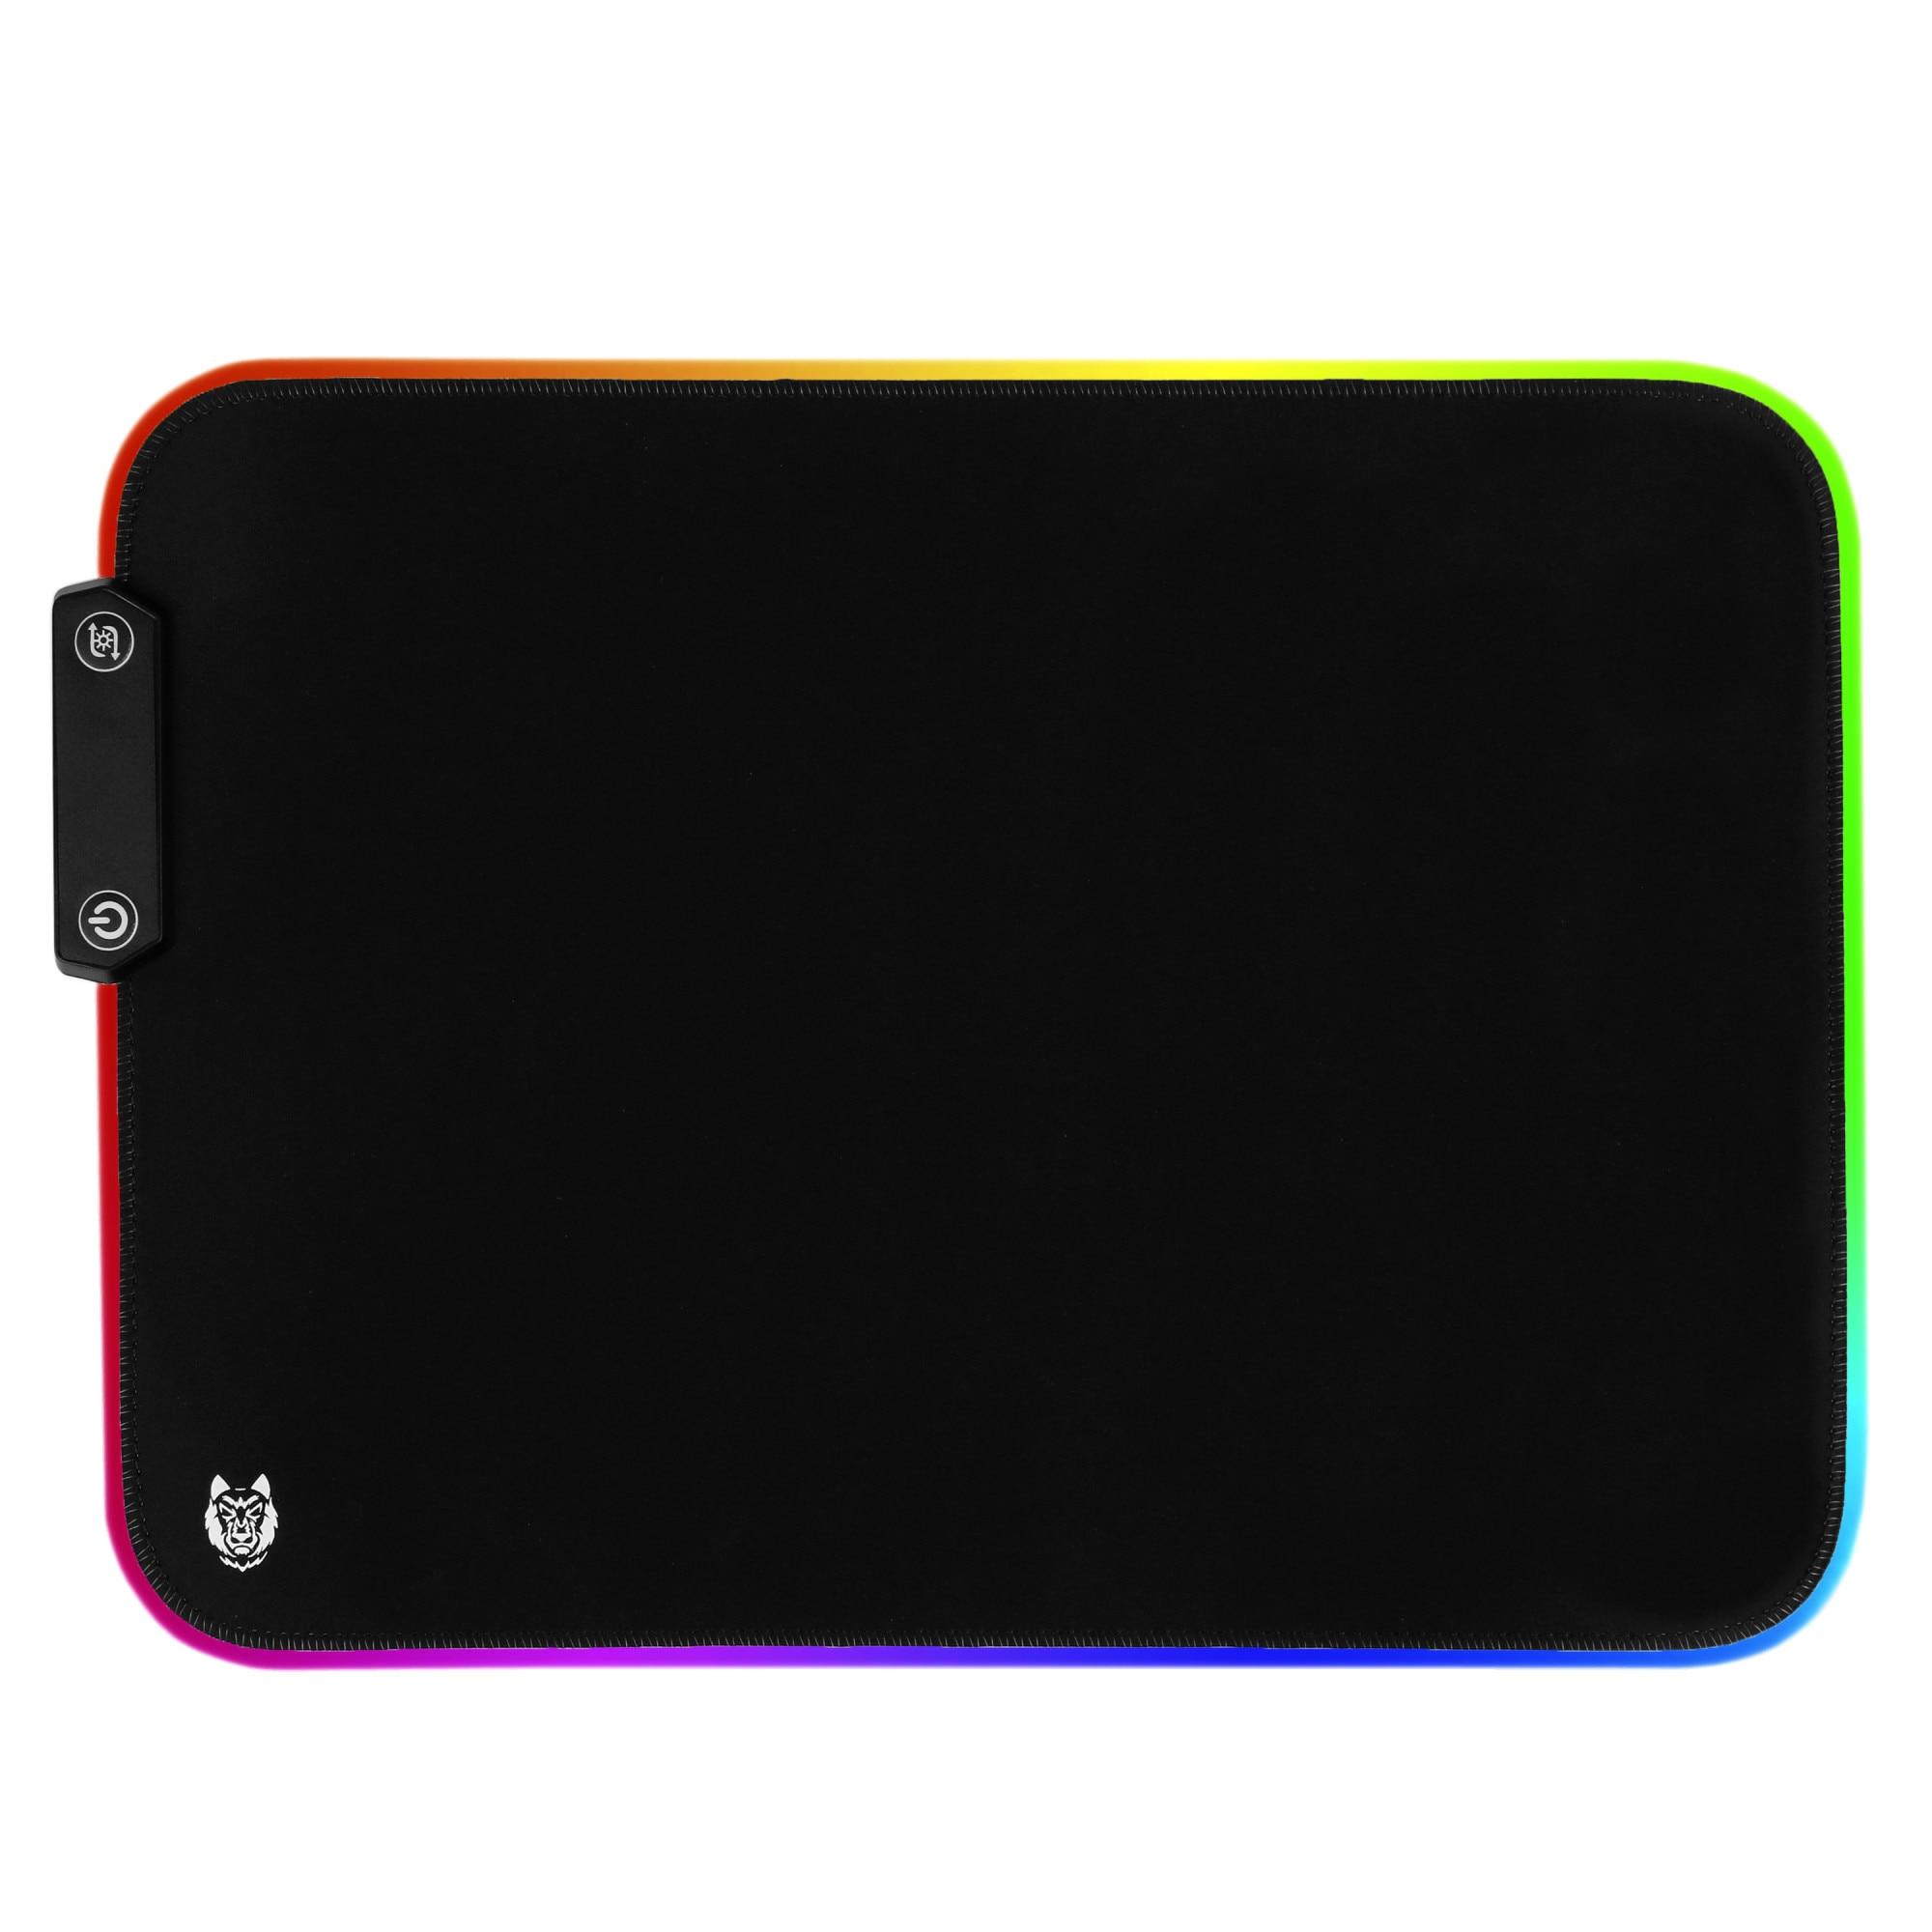 Fotografie Mousepad Gaming A+ Kuan, iluminat, 360*260*3 mm